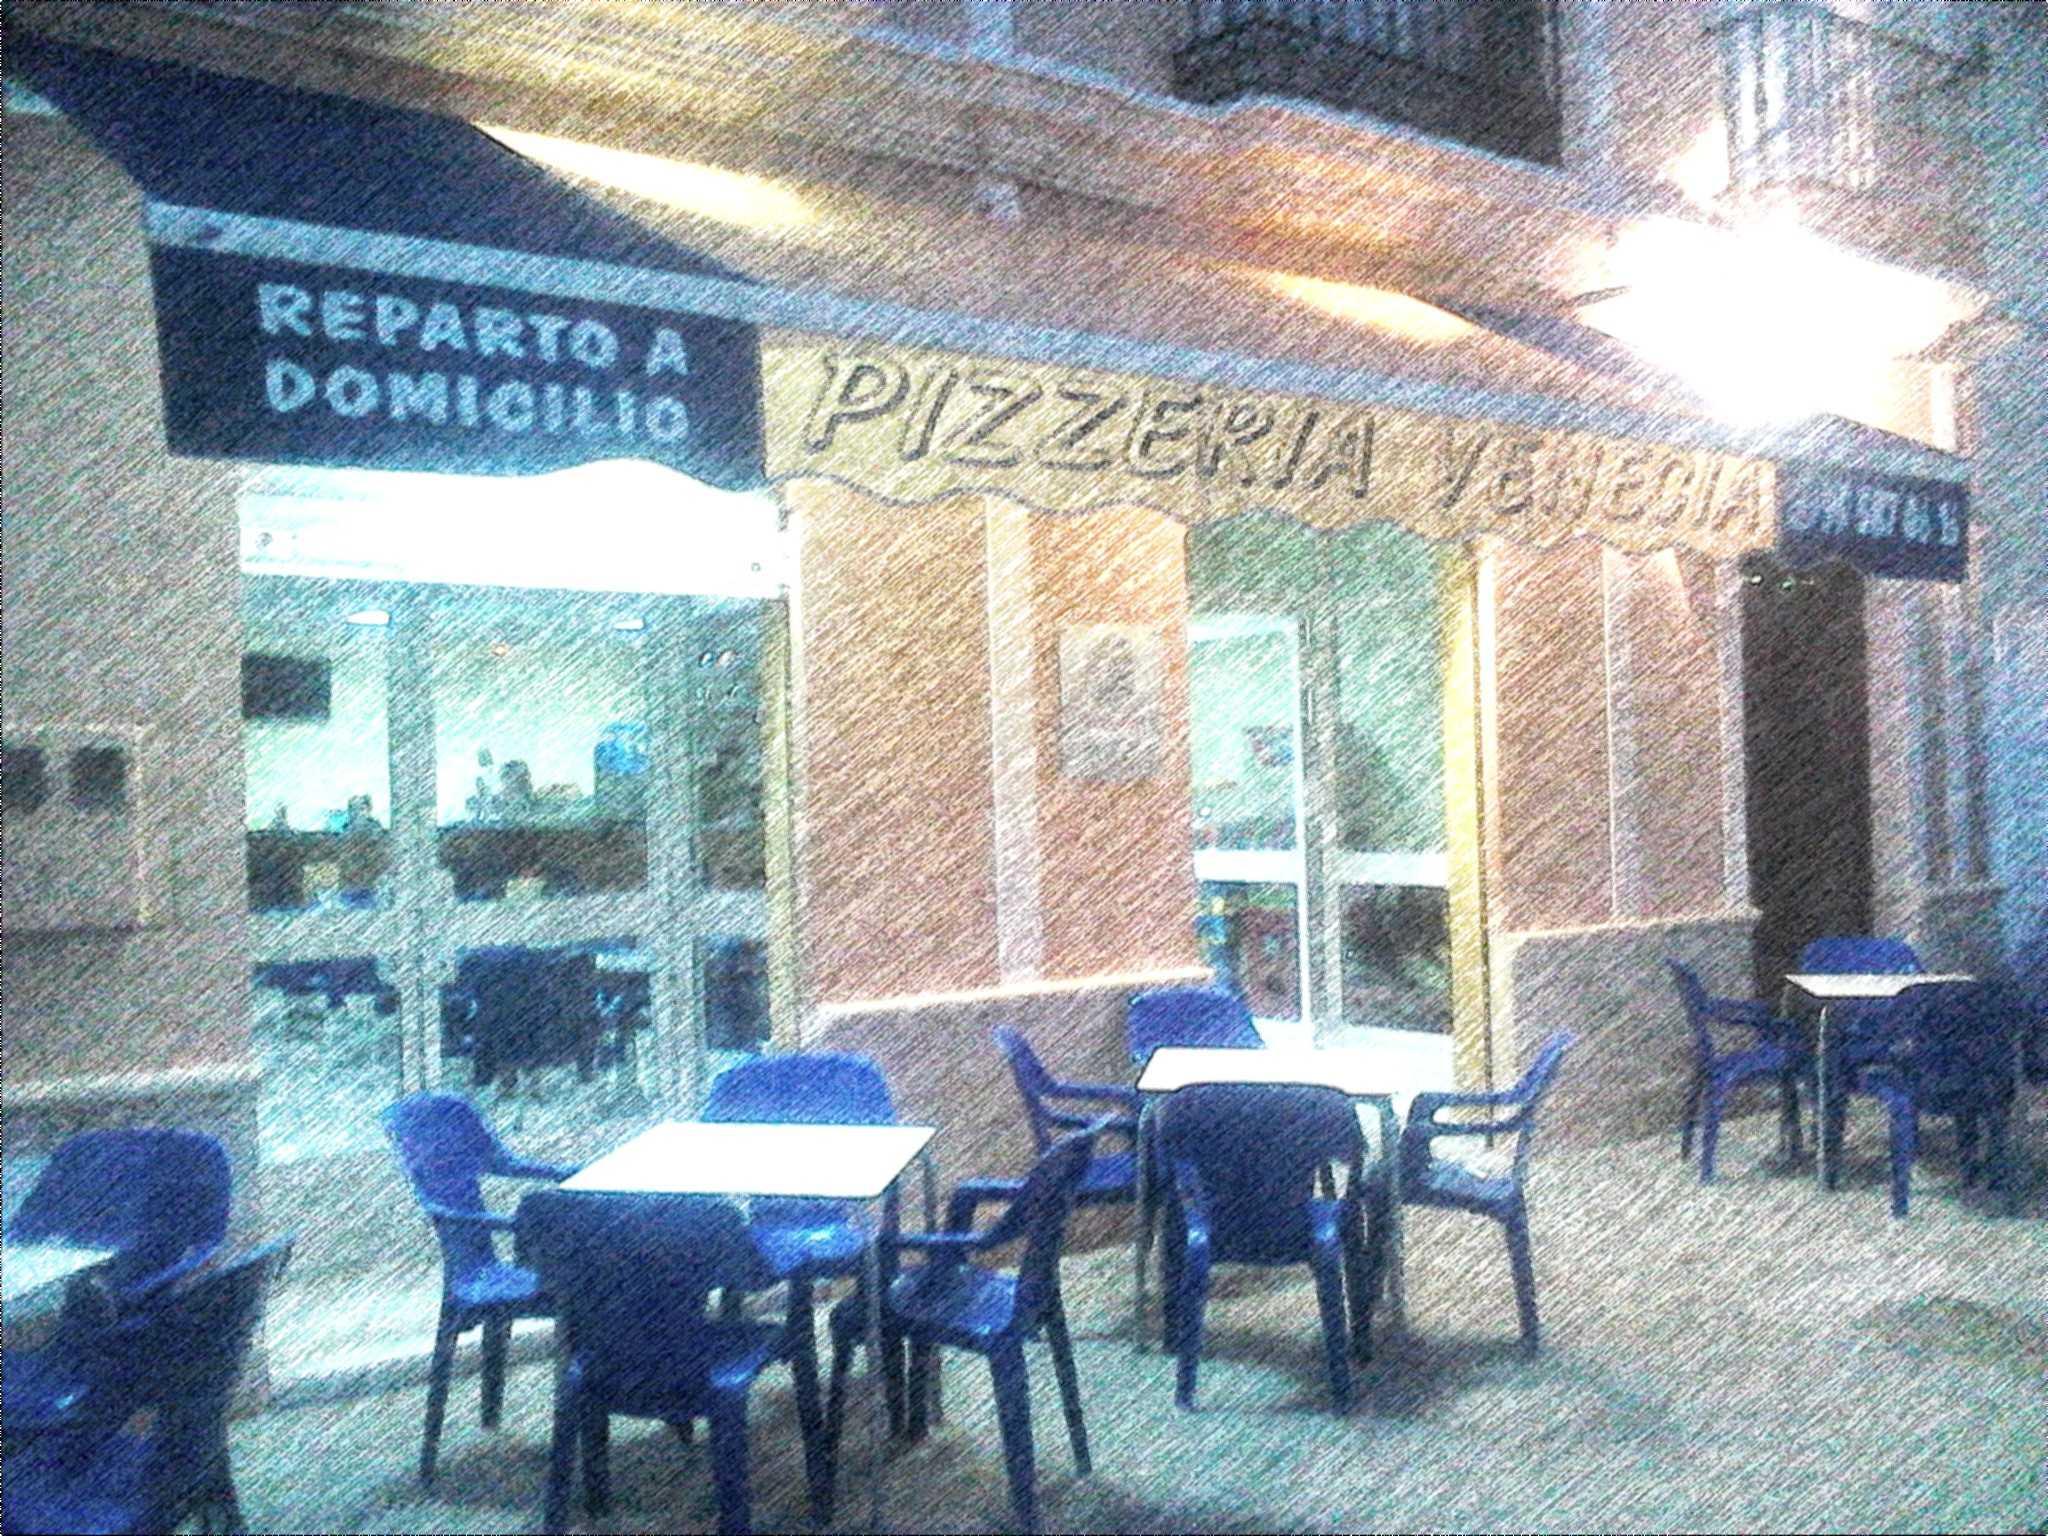 Pizzeria venecia - Pizzeria venecia marbella ...